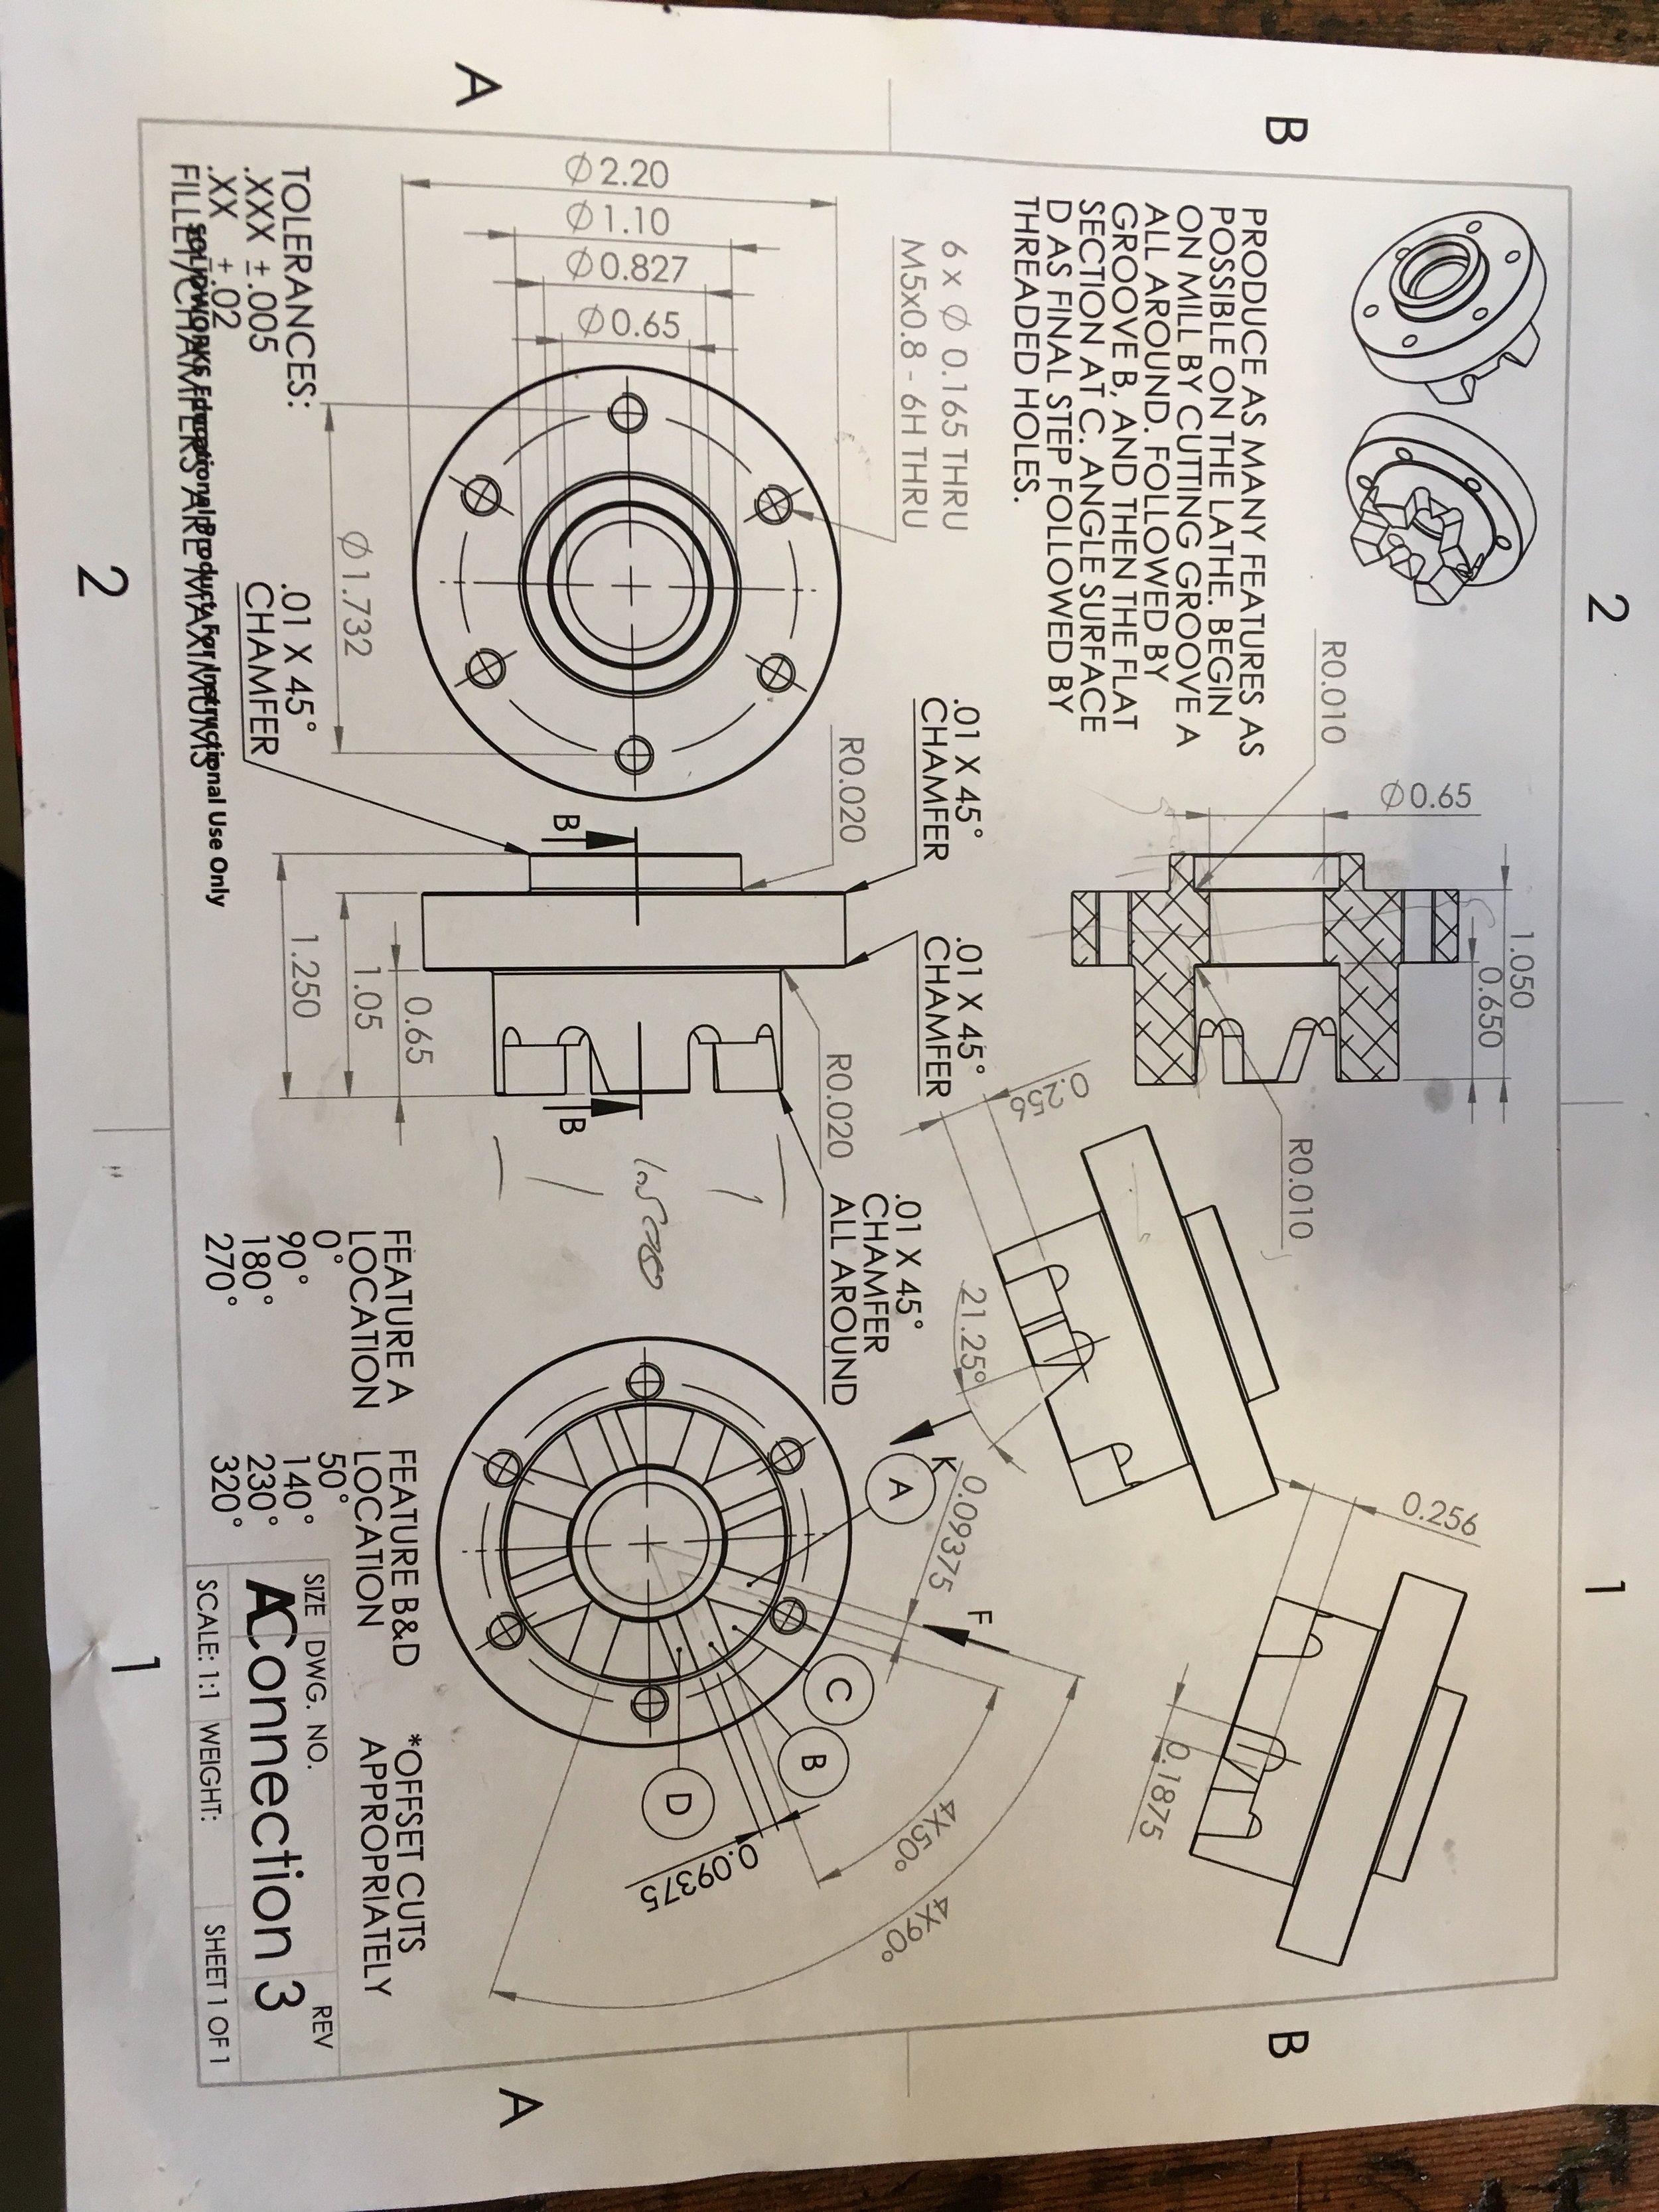 Engineering drawings for our reverse-gearing mechanism